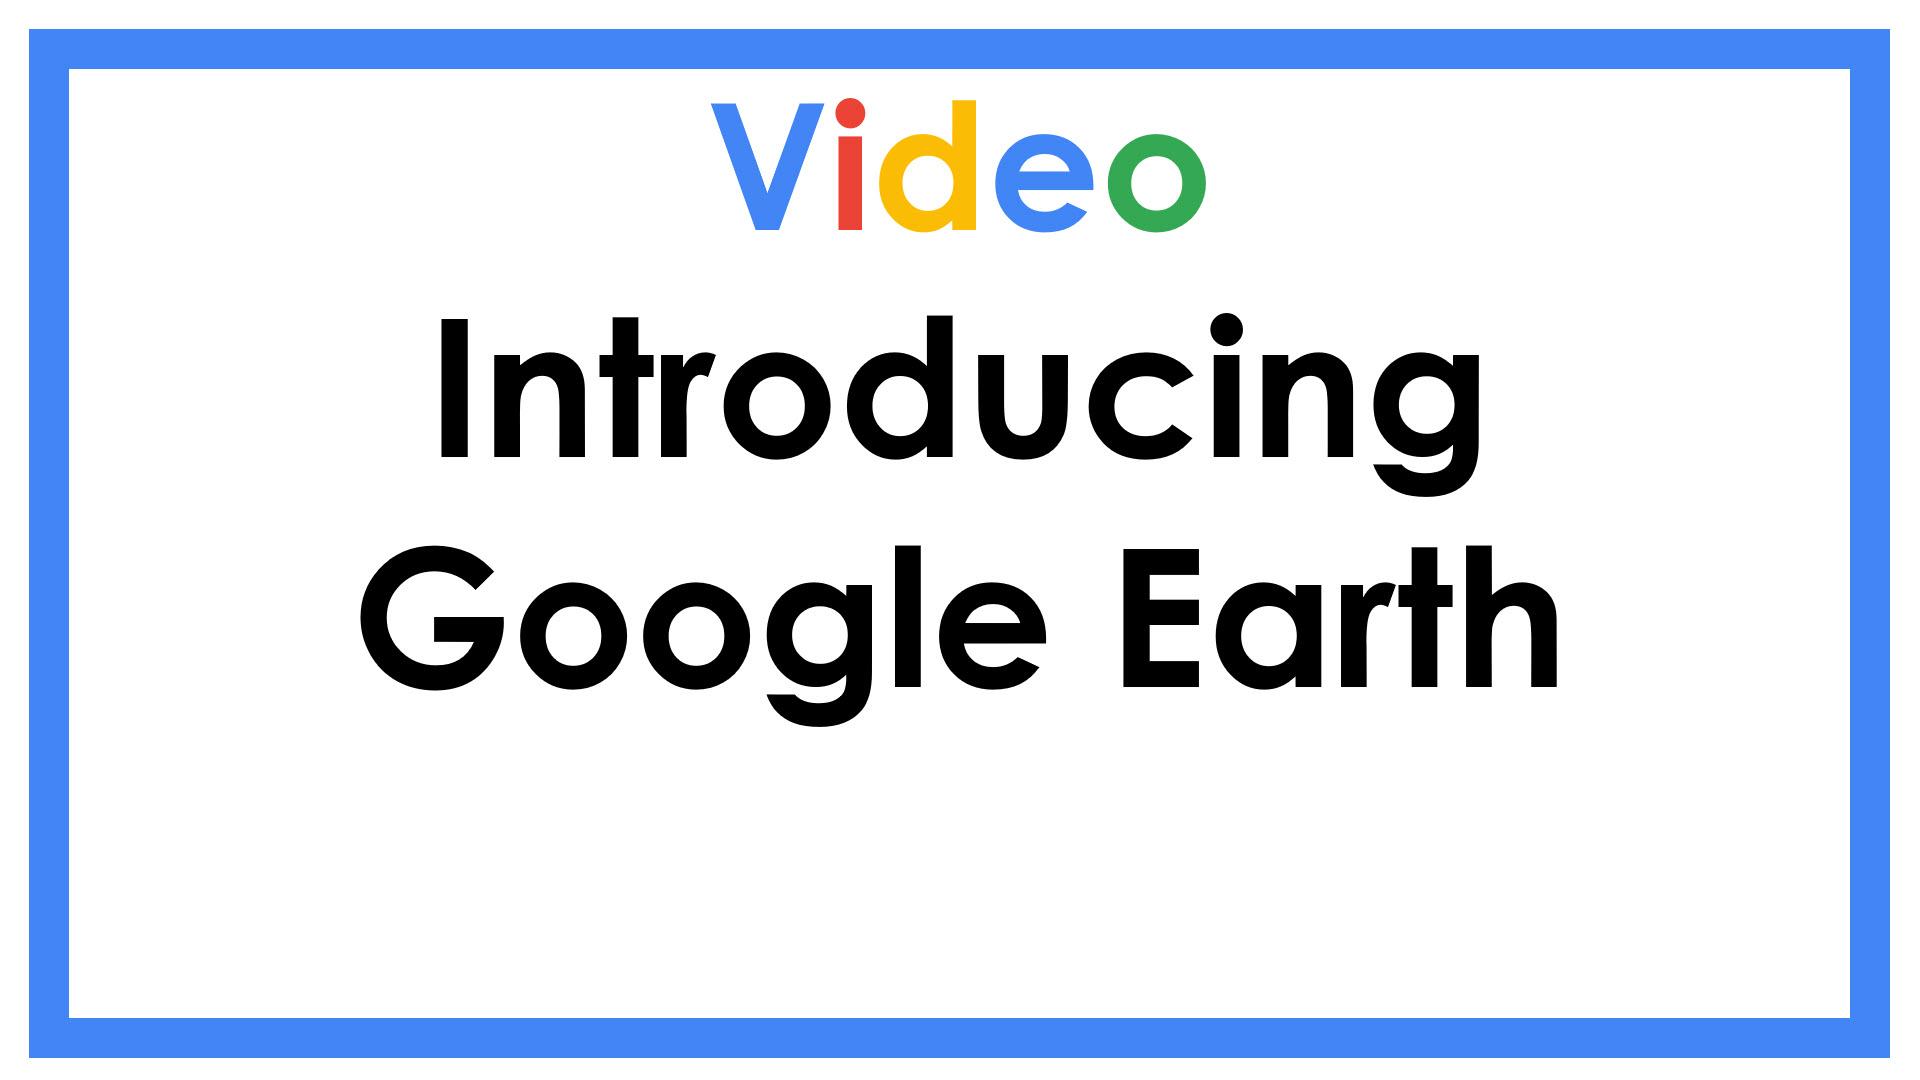 Introducing Google Earth